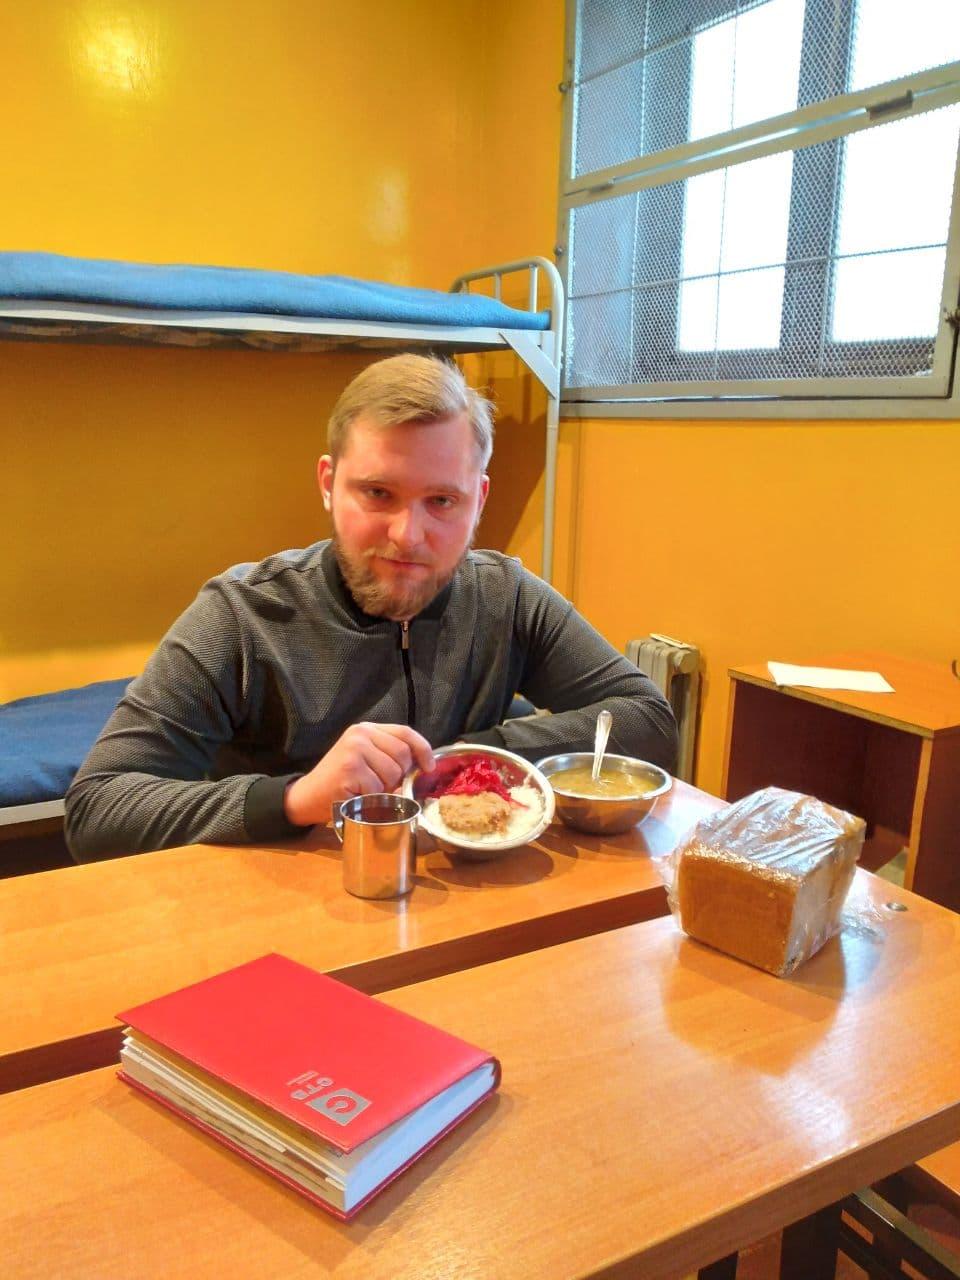 Григорий Азаренок съездил на Окрестина и опубликовал фото